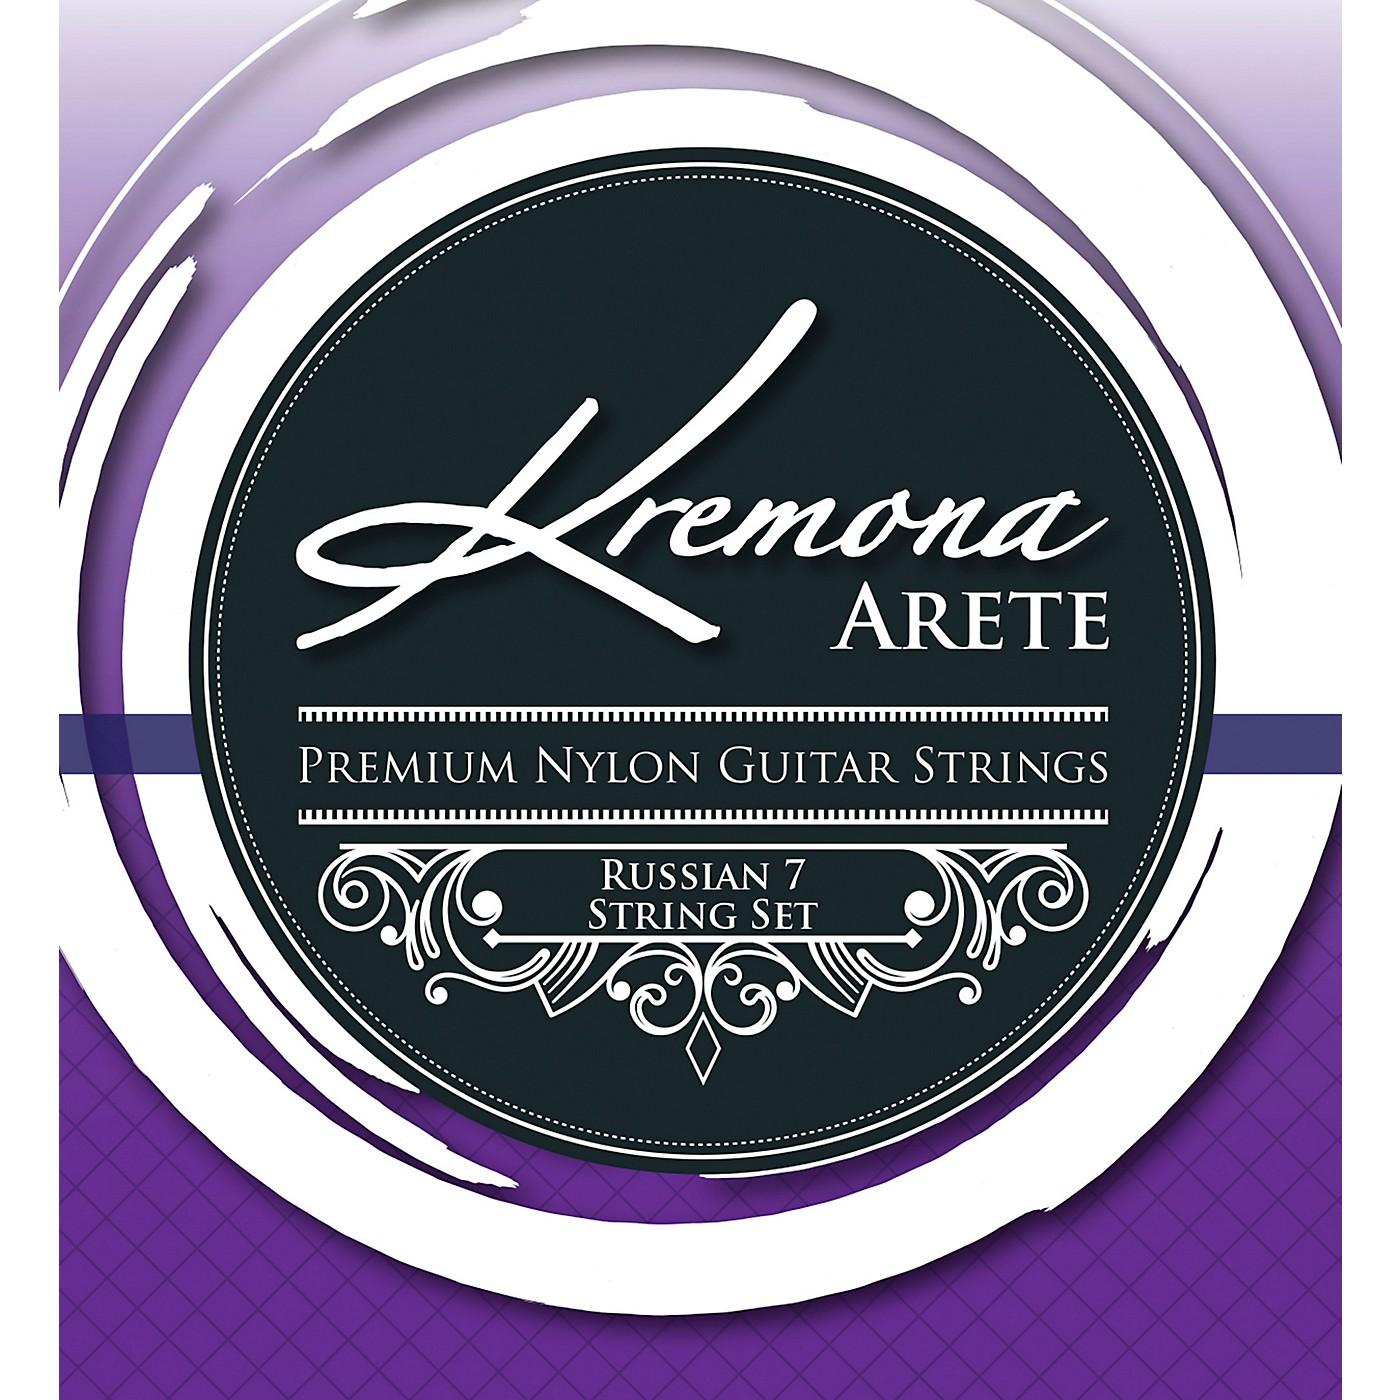 Kremona Arete Premium Nylon Guitar Strings Russian 7 String Set thumbnail